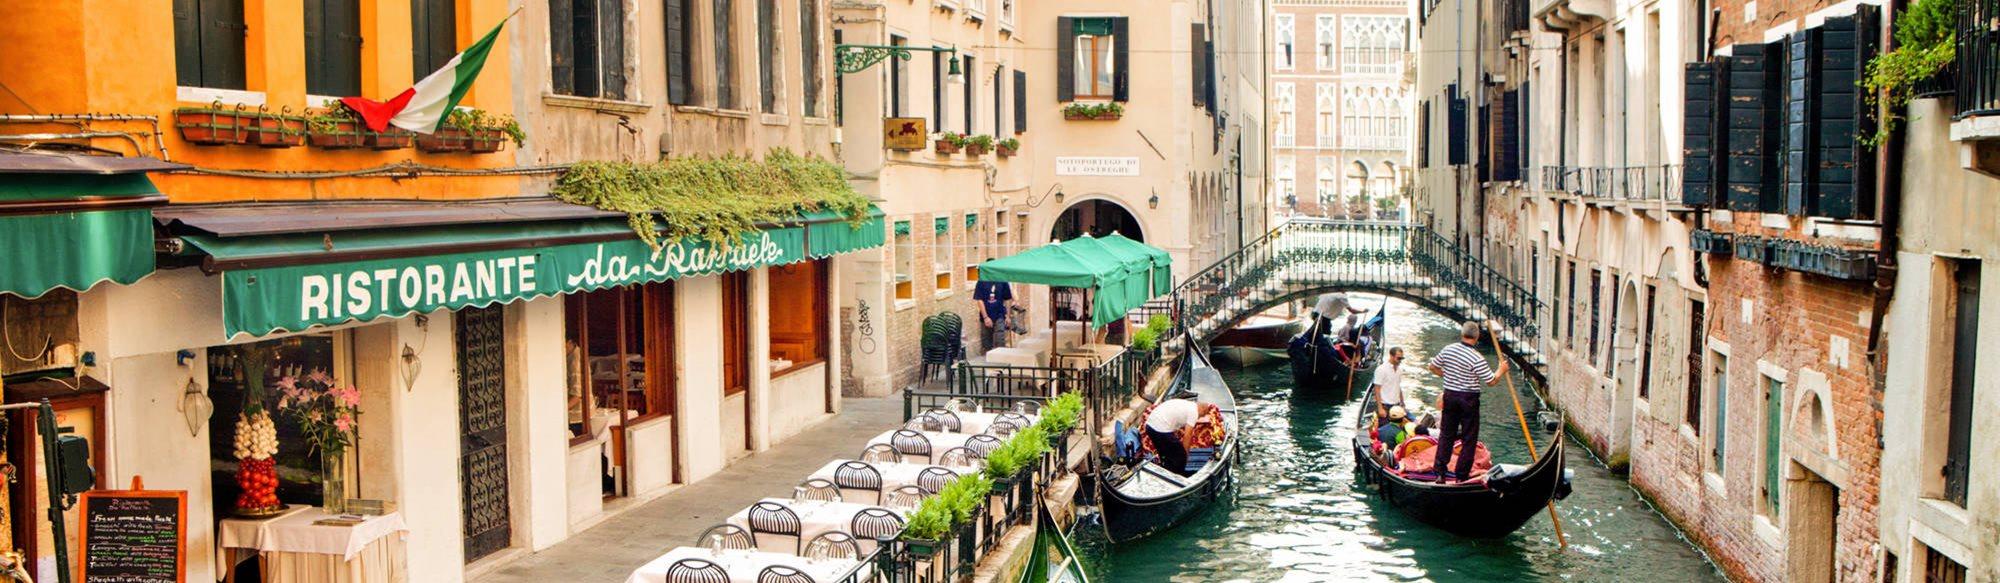 Dating kultur i Italien